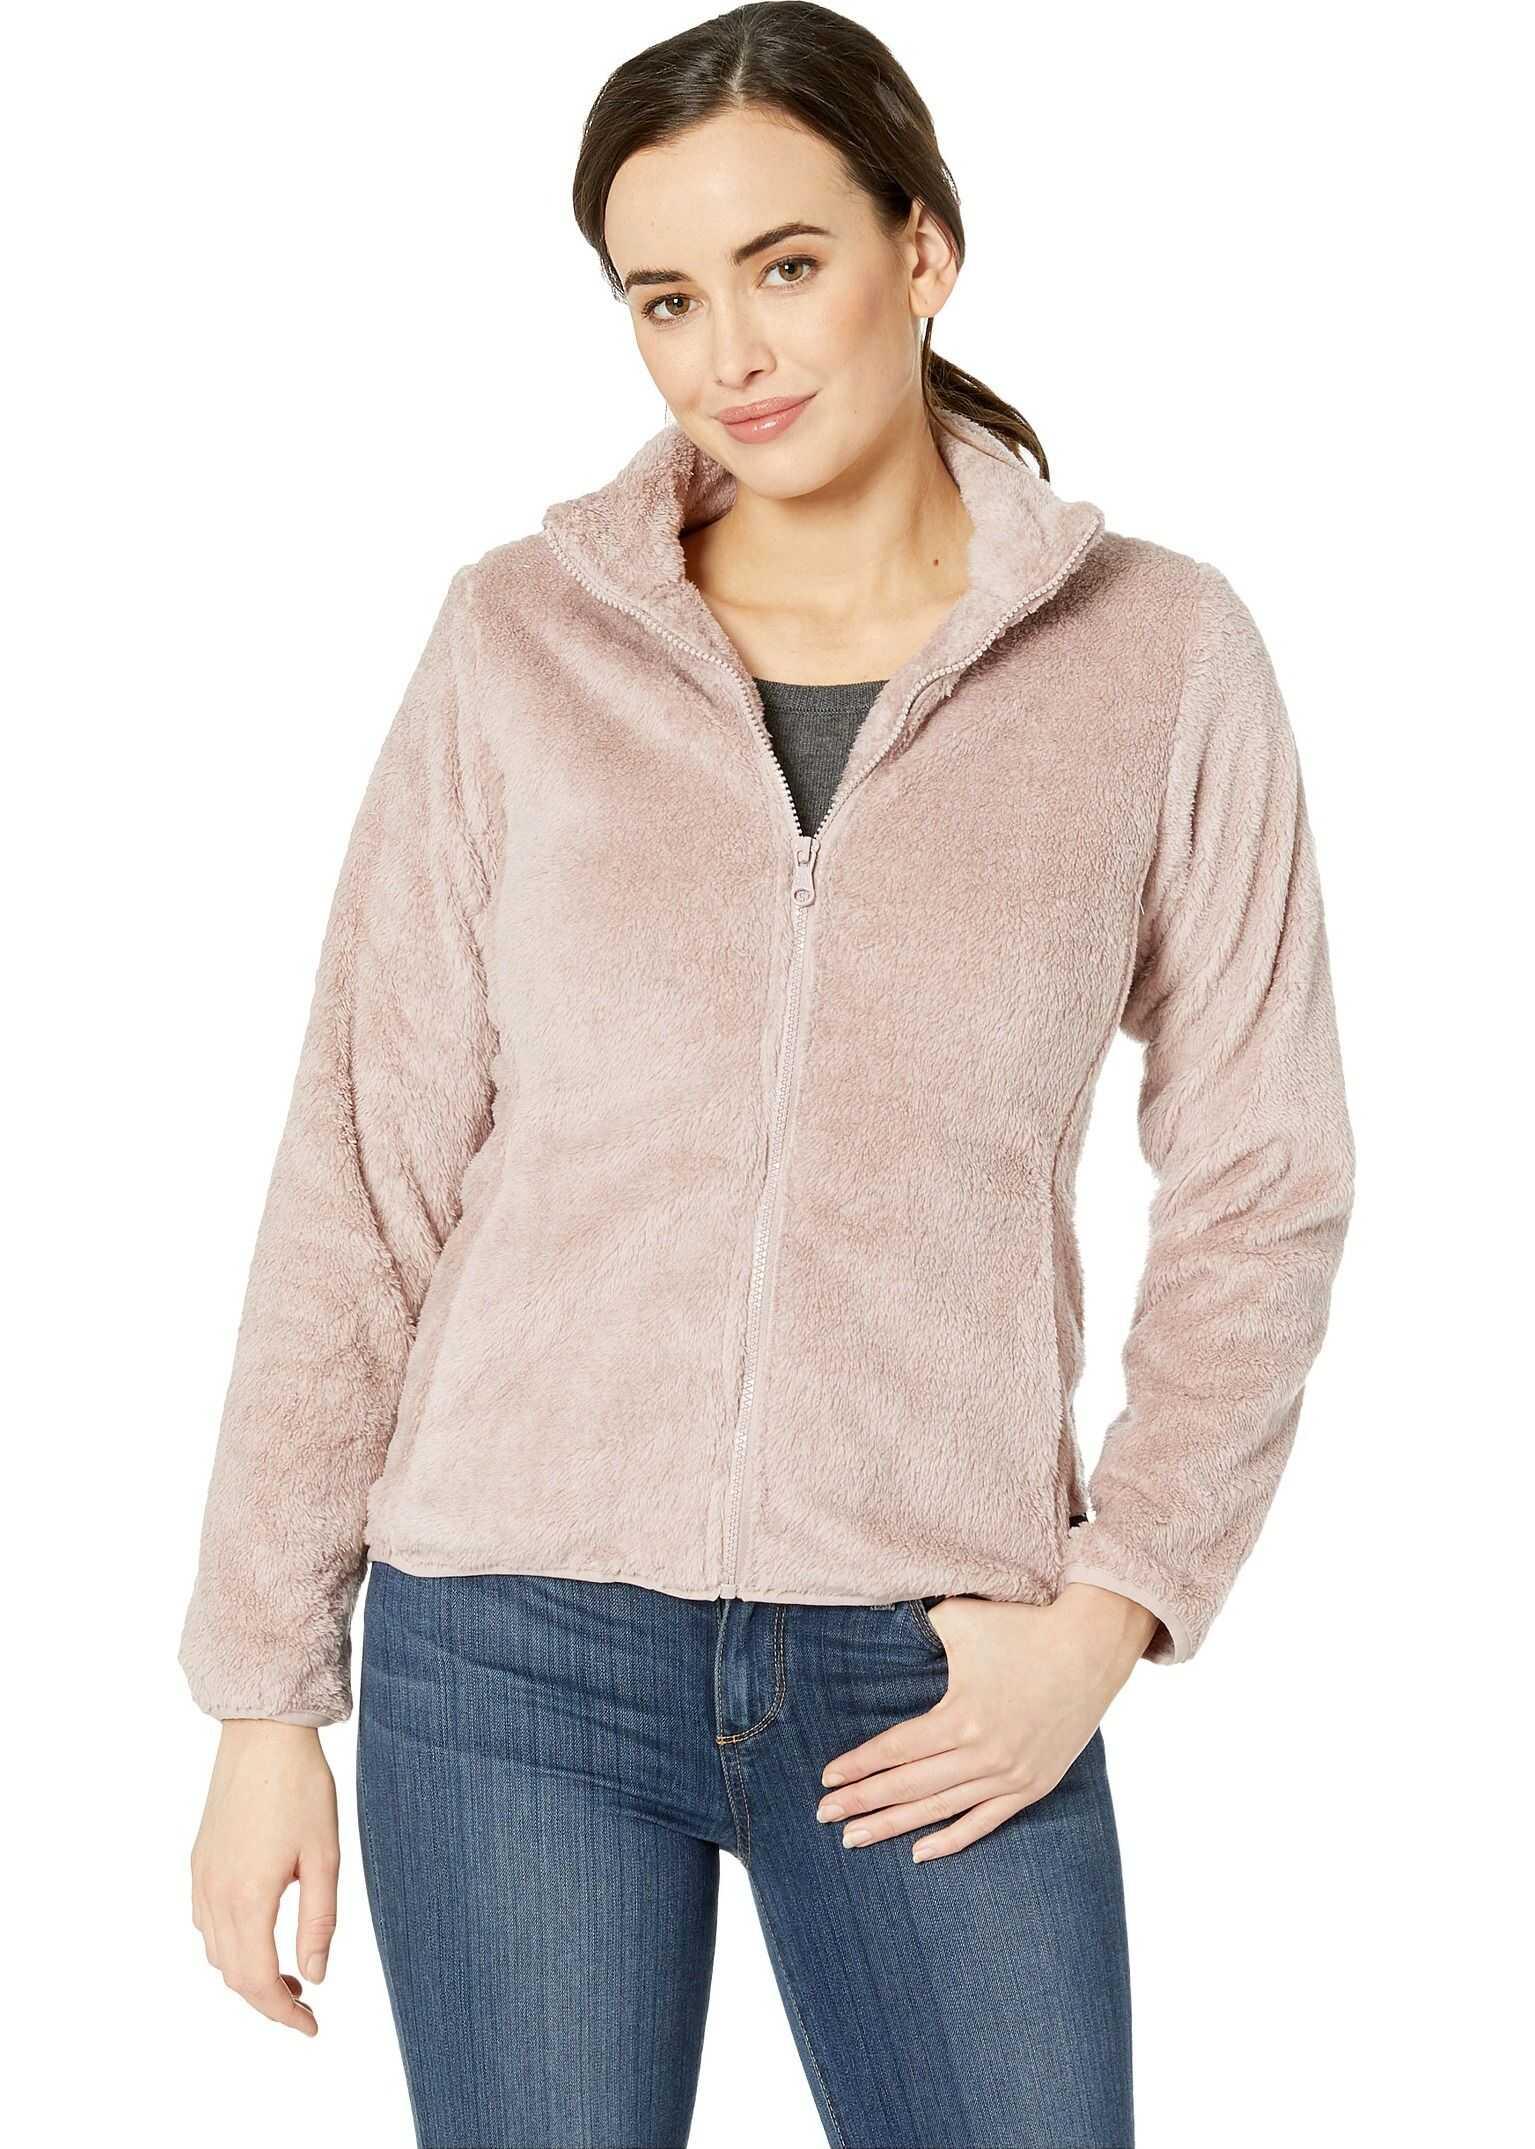 U.S. POLO ASSN. Fleece Jacket Pearl